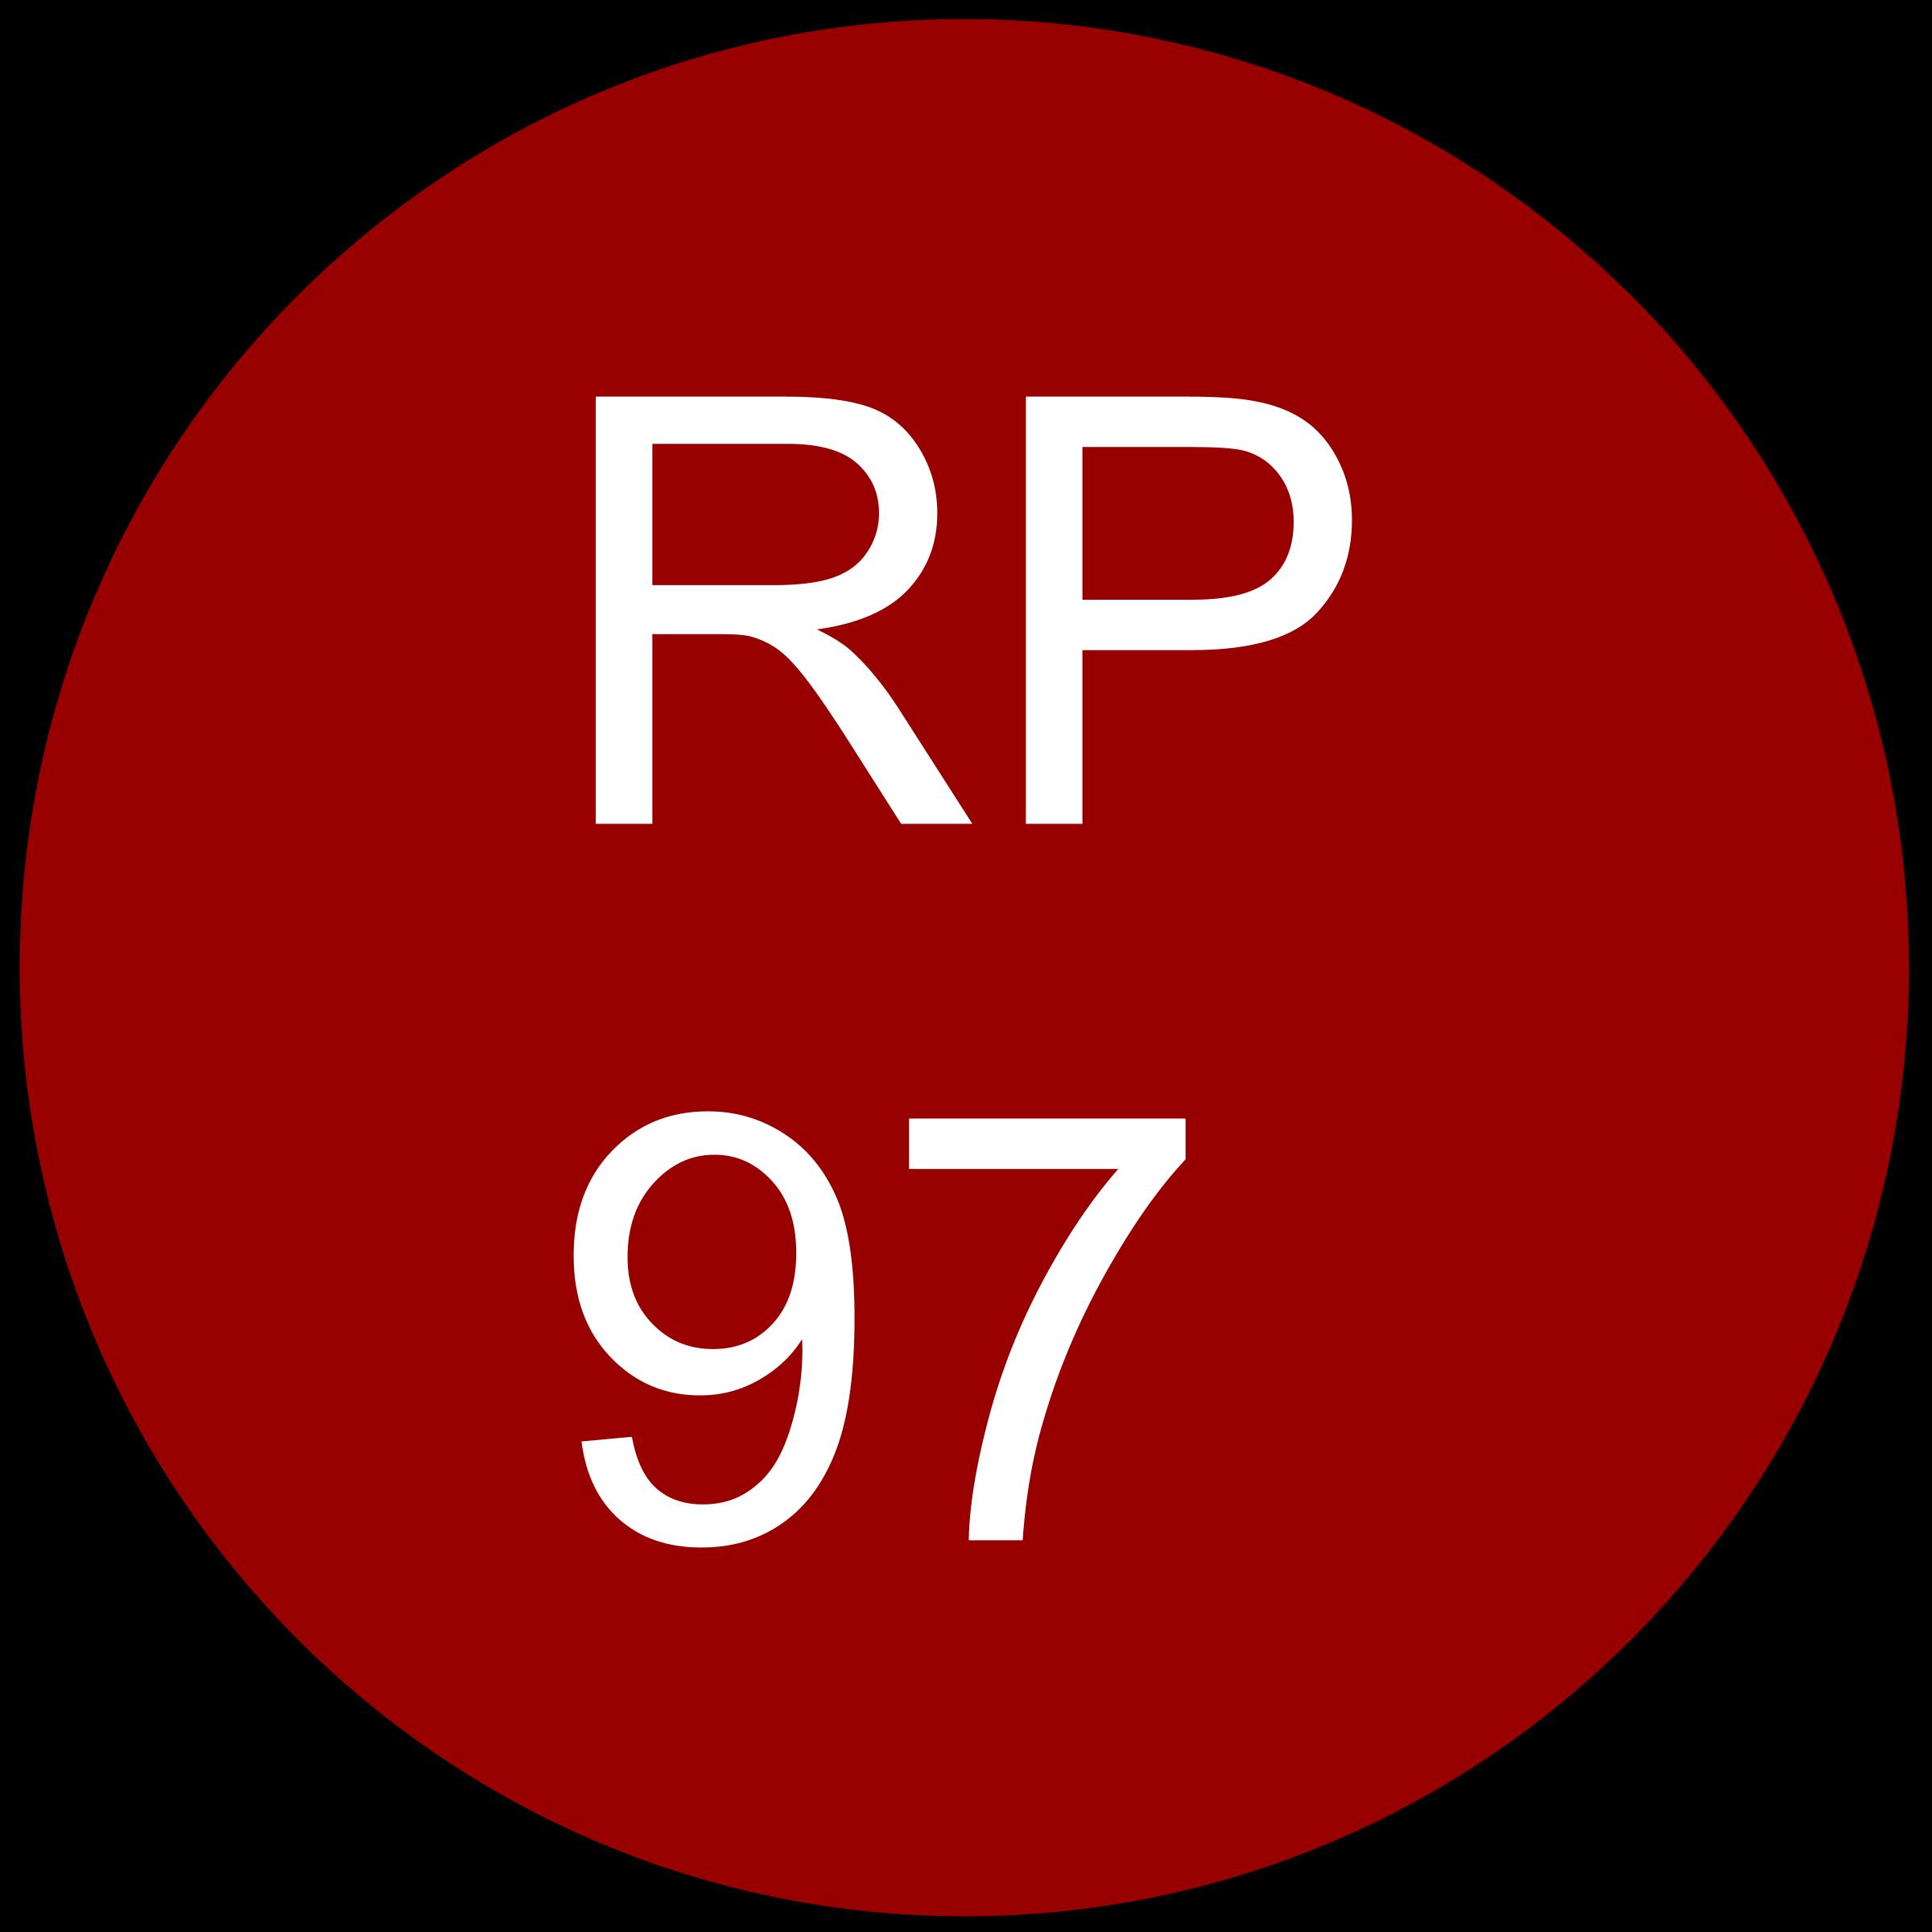 robert-parkers-wine-advocate-97-ratings